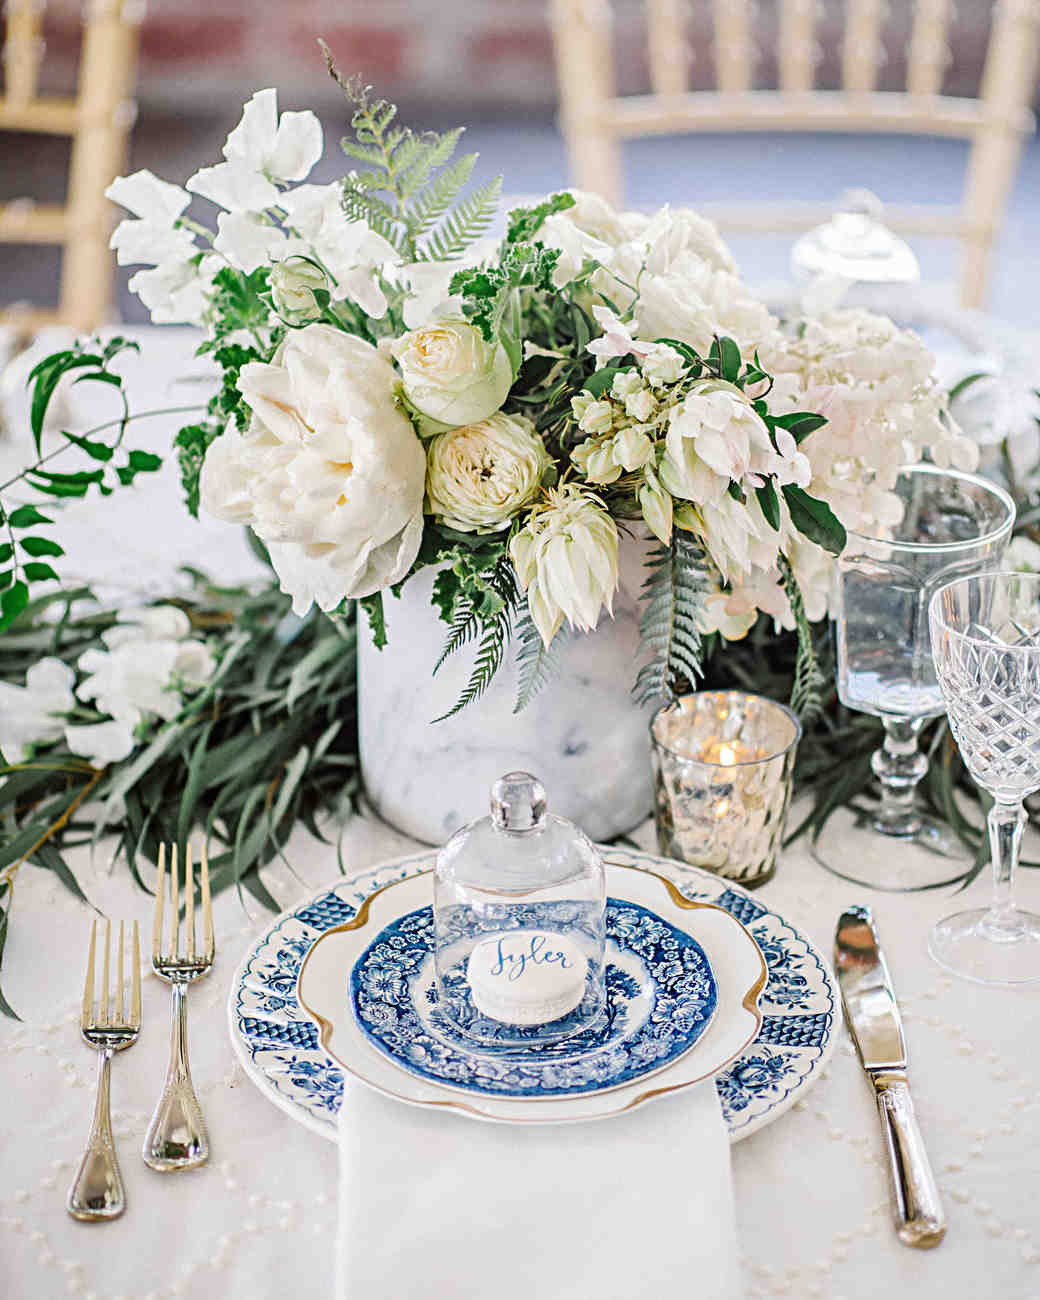 decorative glass beads for vases uk of 79 white wedding centerpieces martha stewart weddings inside hannah steve wedding california china macarons